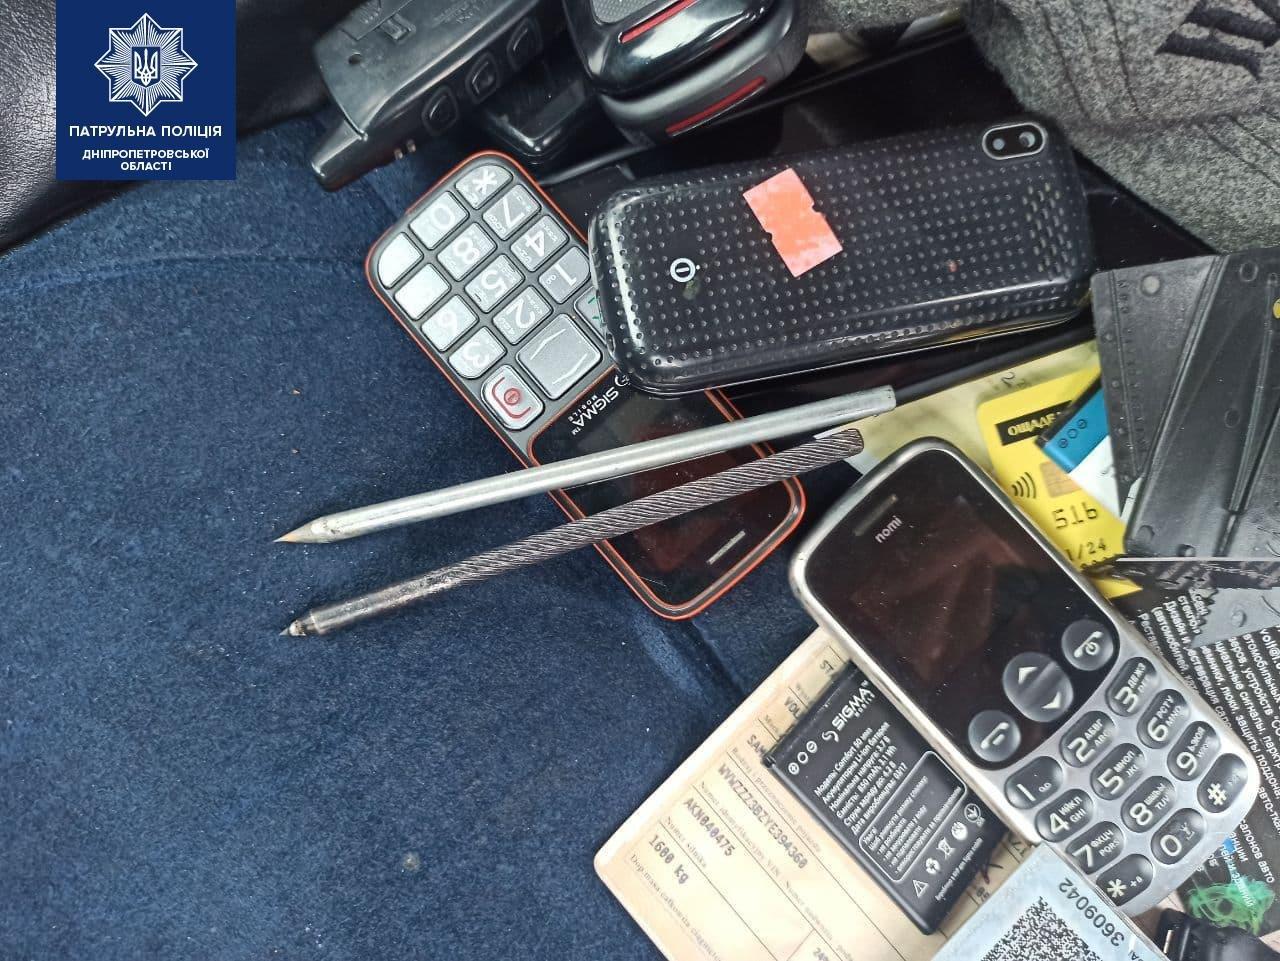 В Днепре преступник в розыске обокрал автомобиль и сбегал от полиции, - ФОТО, фото-2